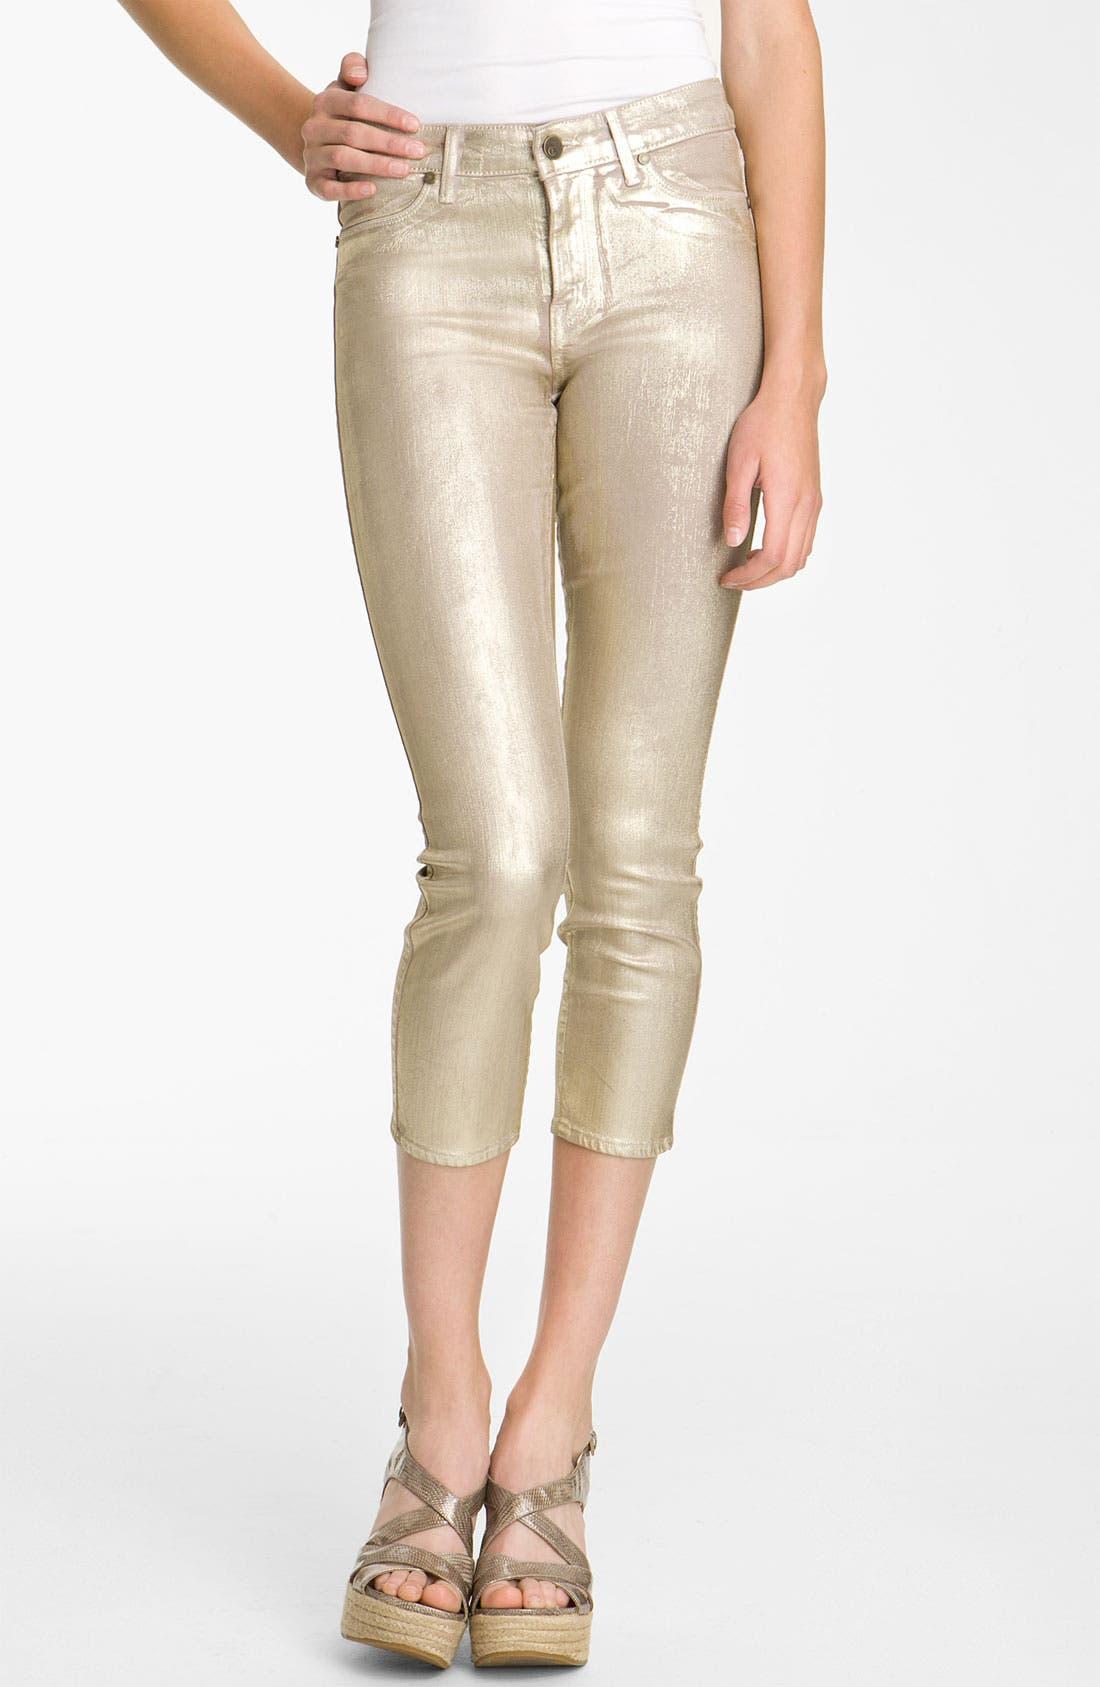 Alternate Image 1 Selected - CJ by Cookie Johnson 'Believe Sparkle' Coated Crop Denim Leggings (Gold Dust)